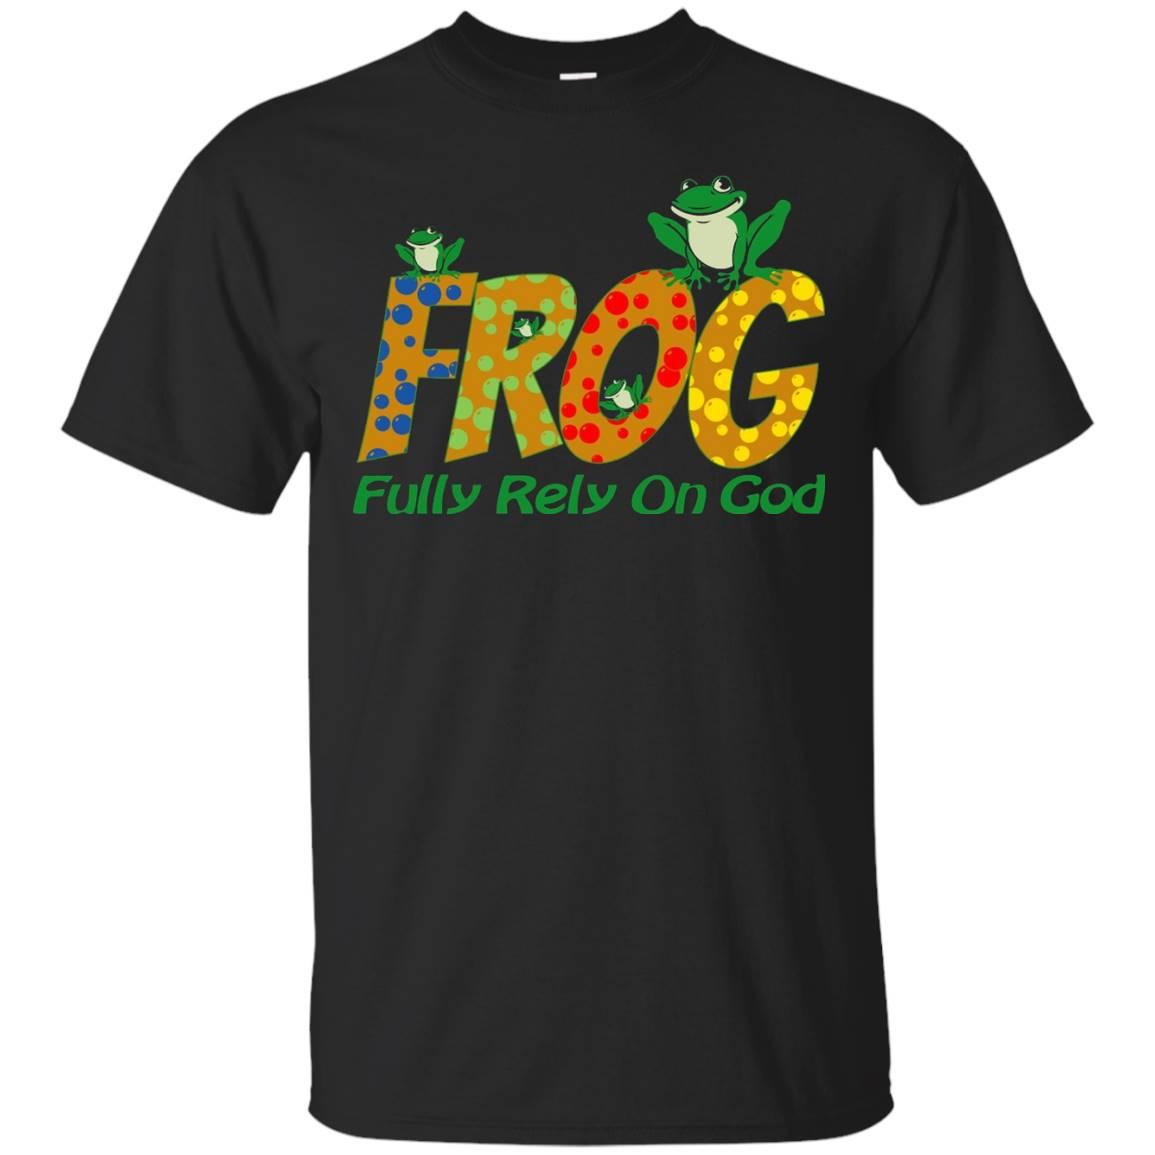 FROG Fully Rely On God Faith Religion Belief Christ T-Shirt